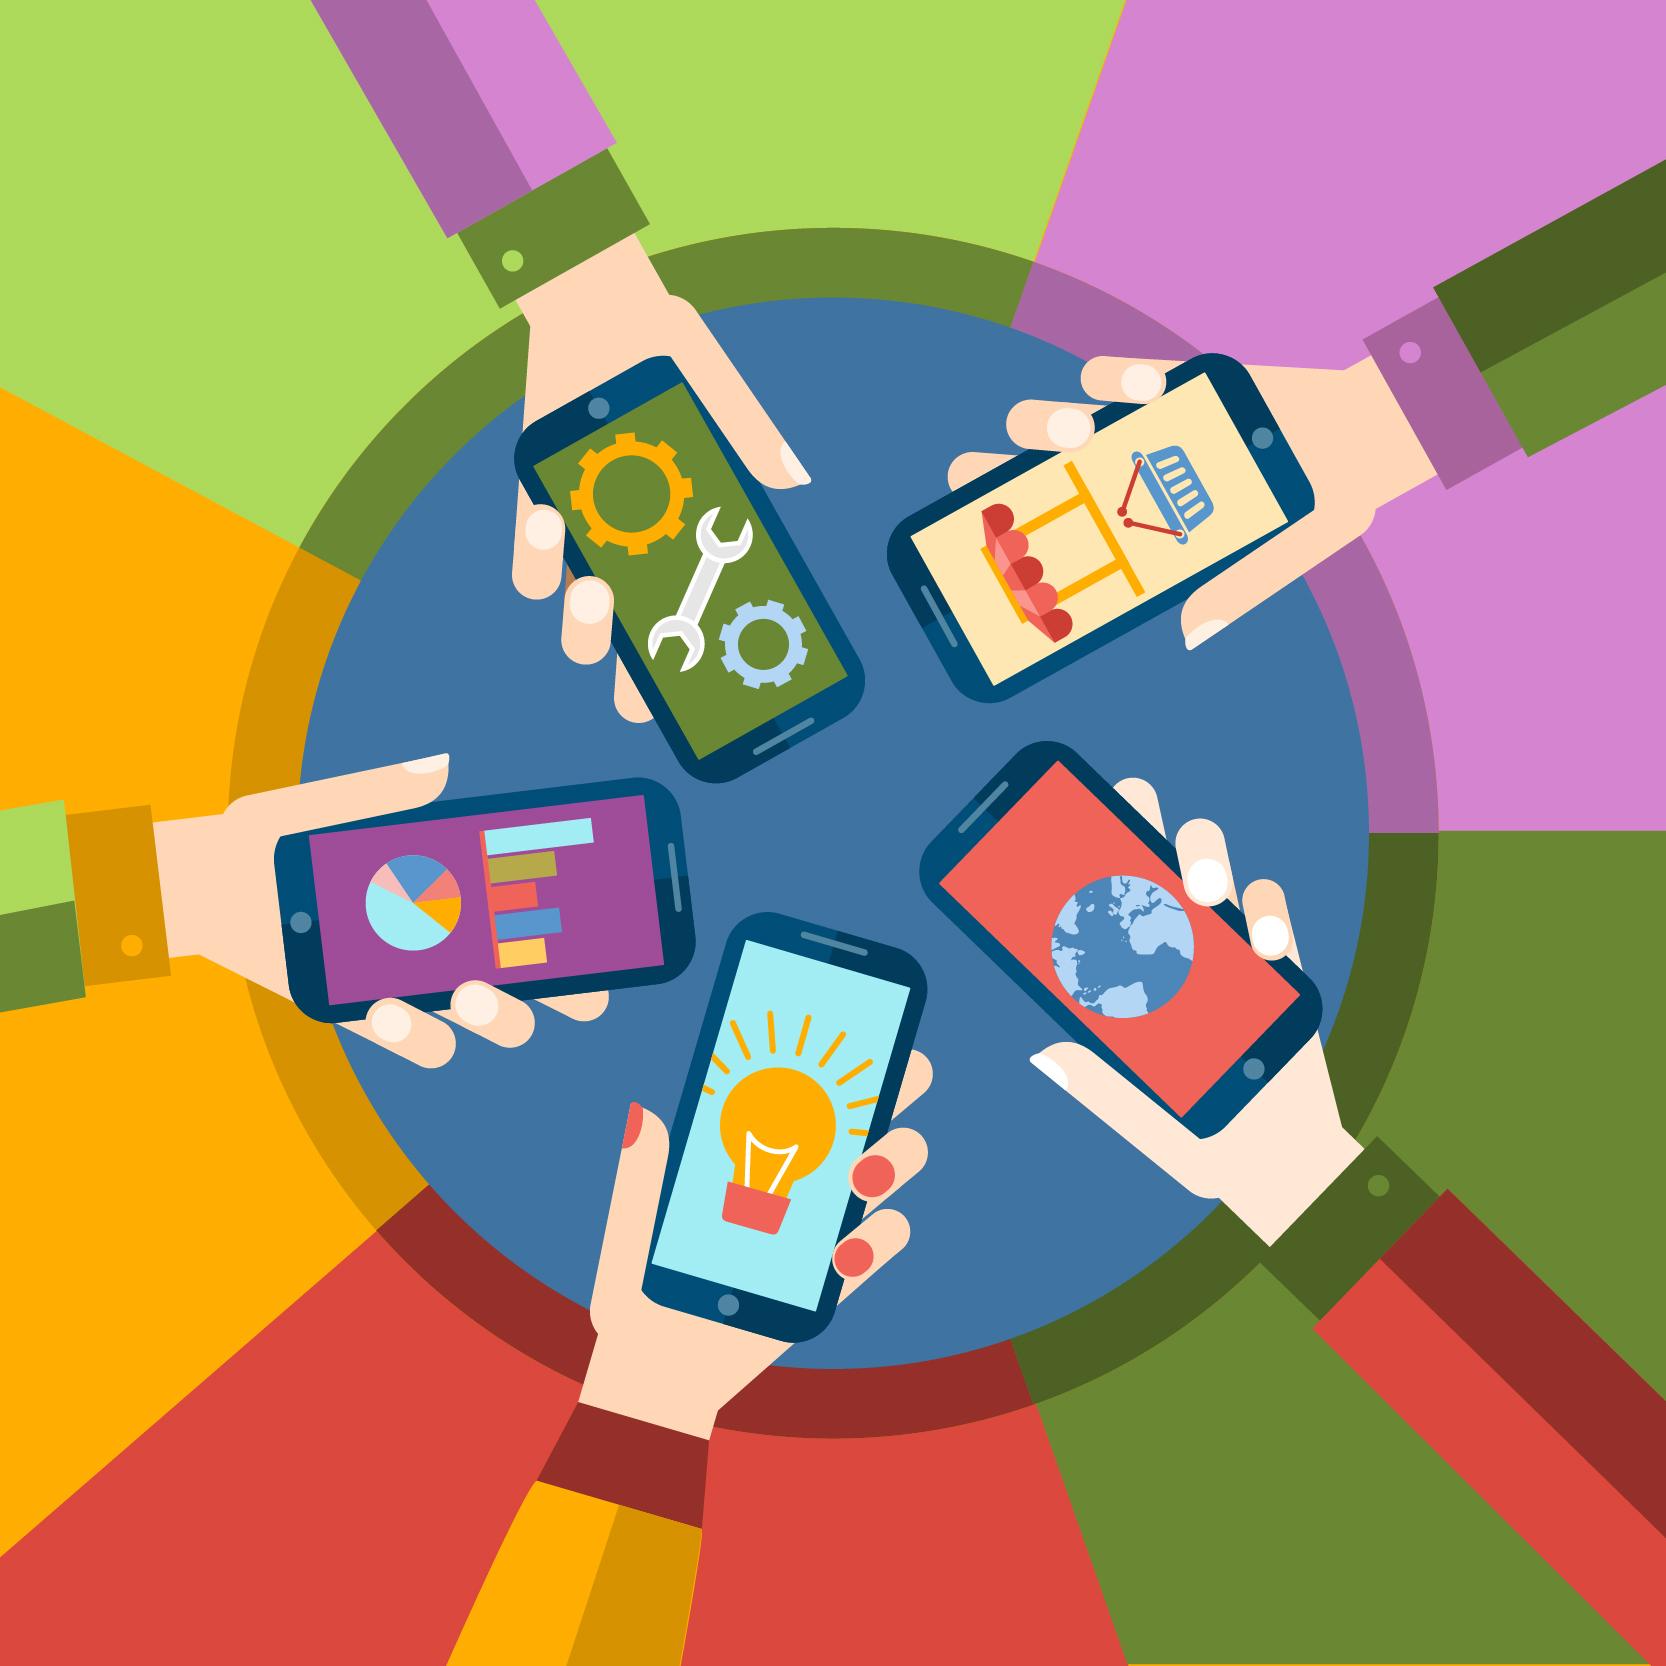 5 aplicativos que todo organizador de evento deve ter